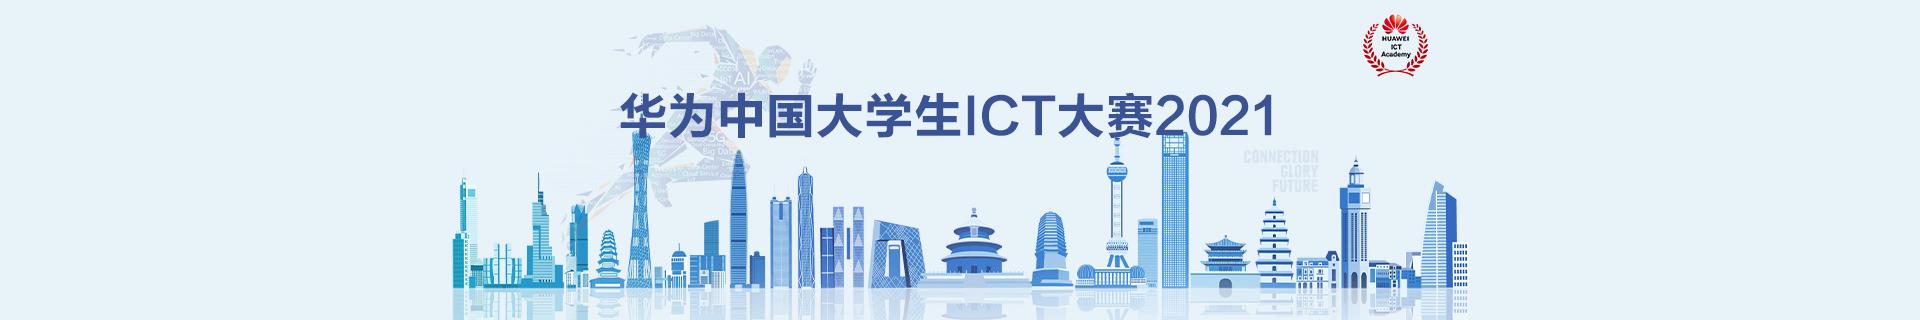 华为ICT